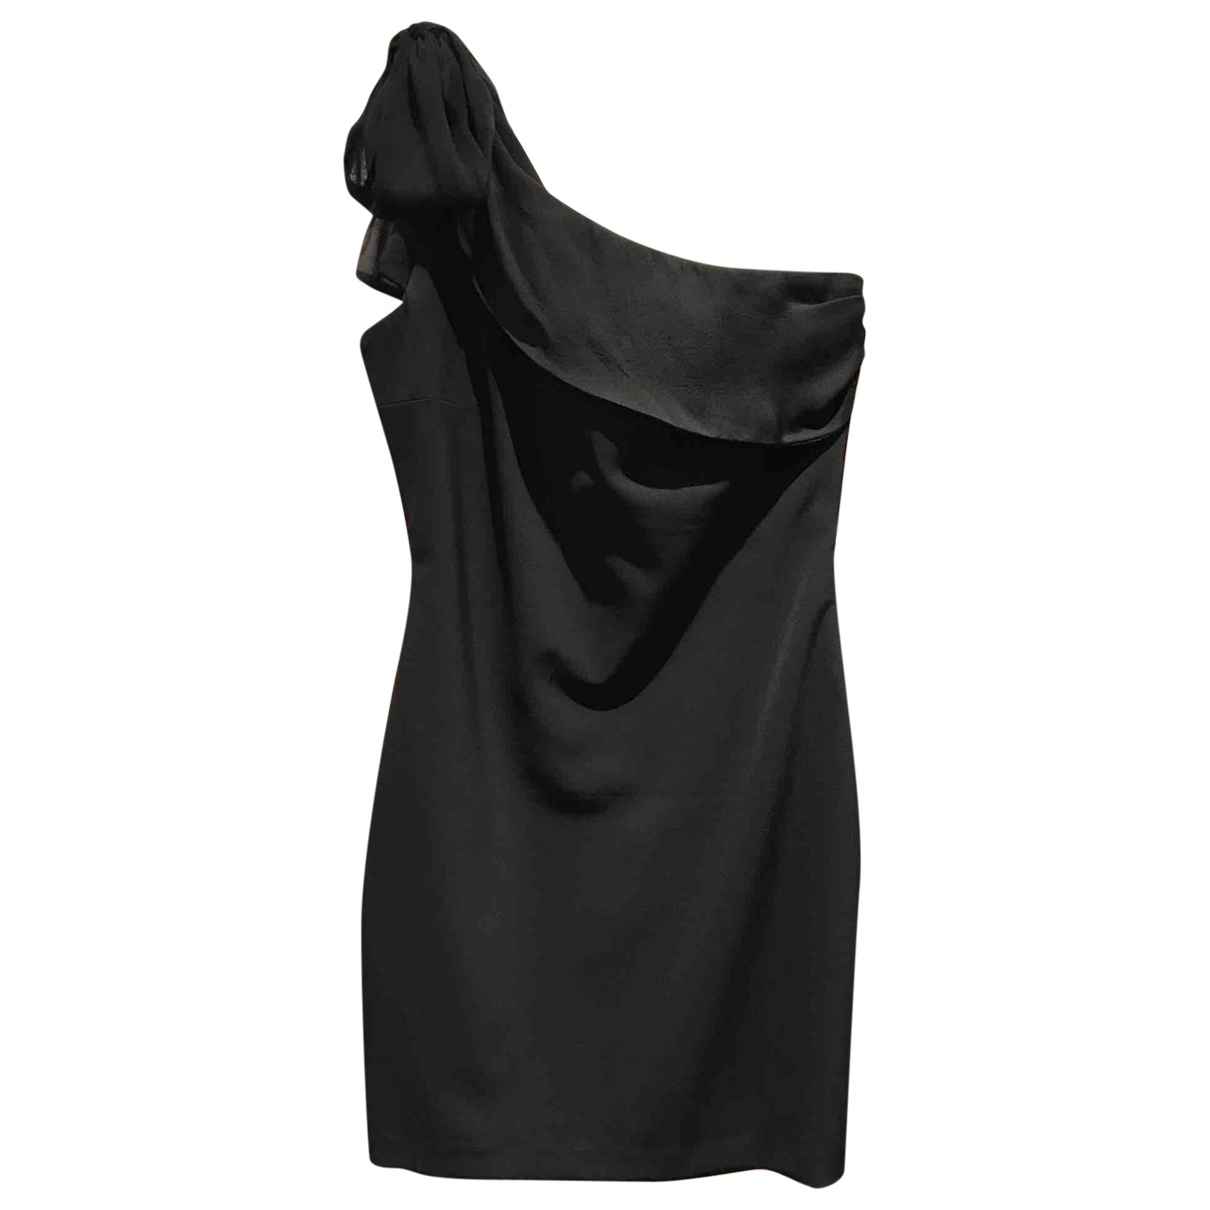 Elisabetta Franchi \N Black Cotton - elasthane dress for Women 44 IT